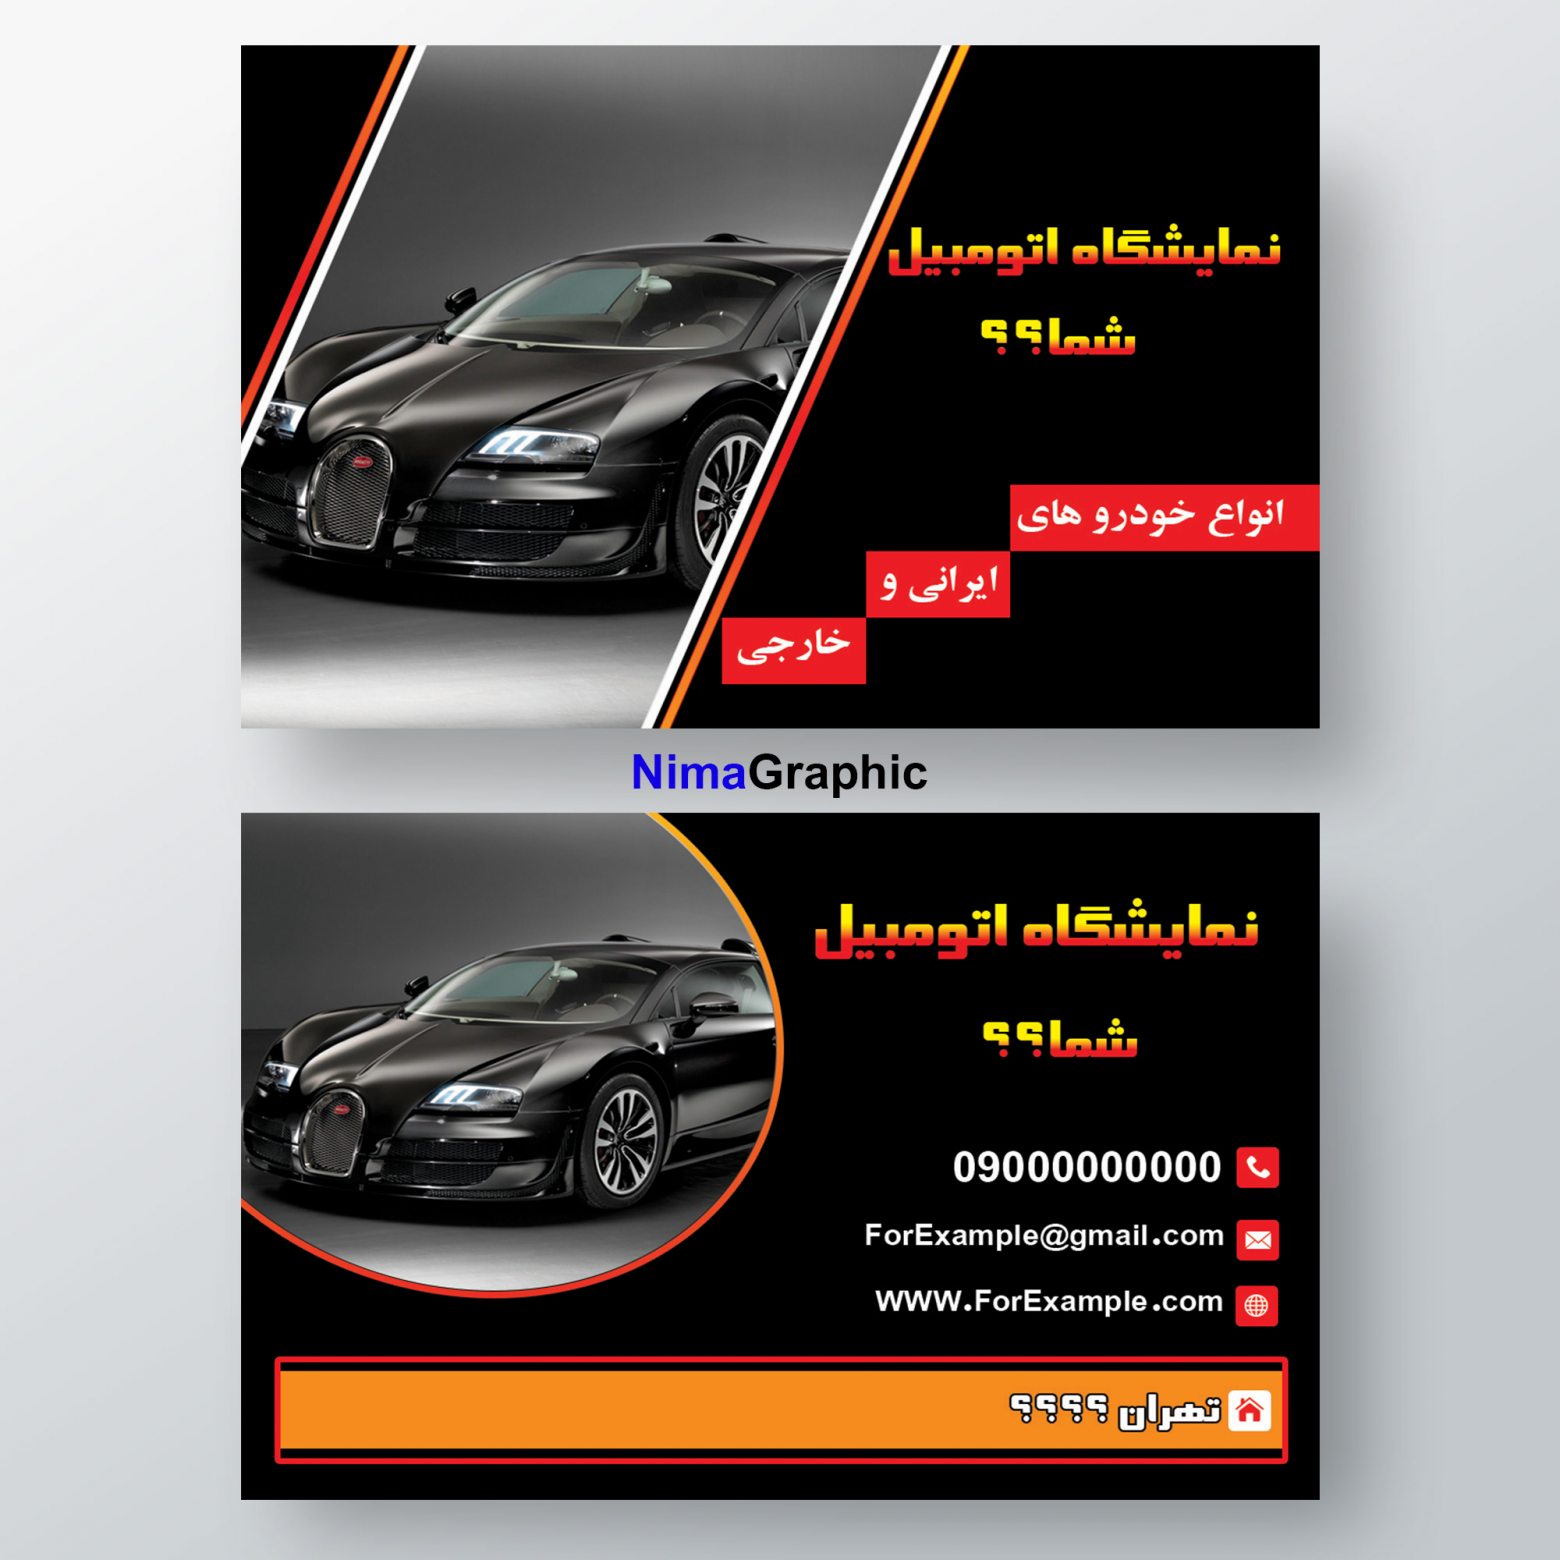 902 1560x1560 - کارت ویزیت لایه باز کارت نمایشگاه ماشین